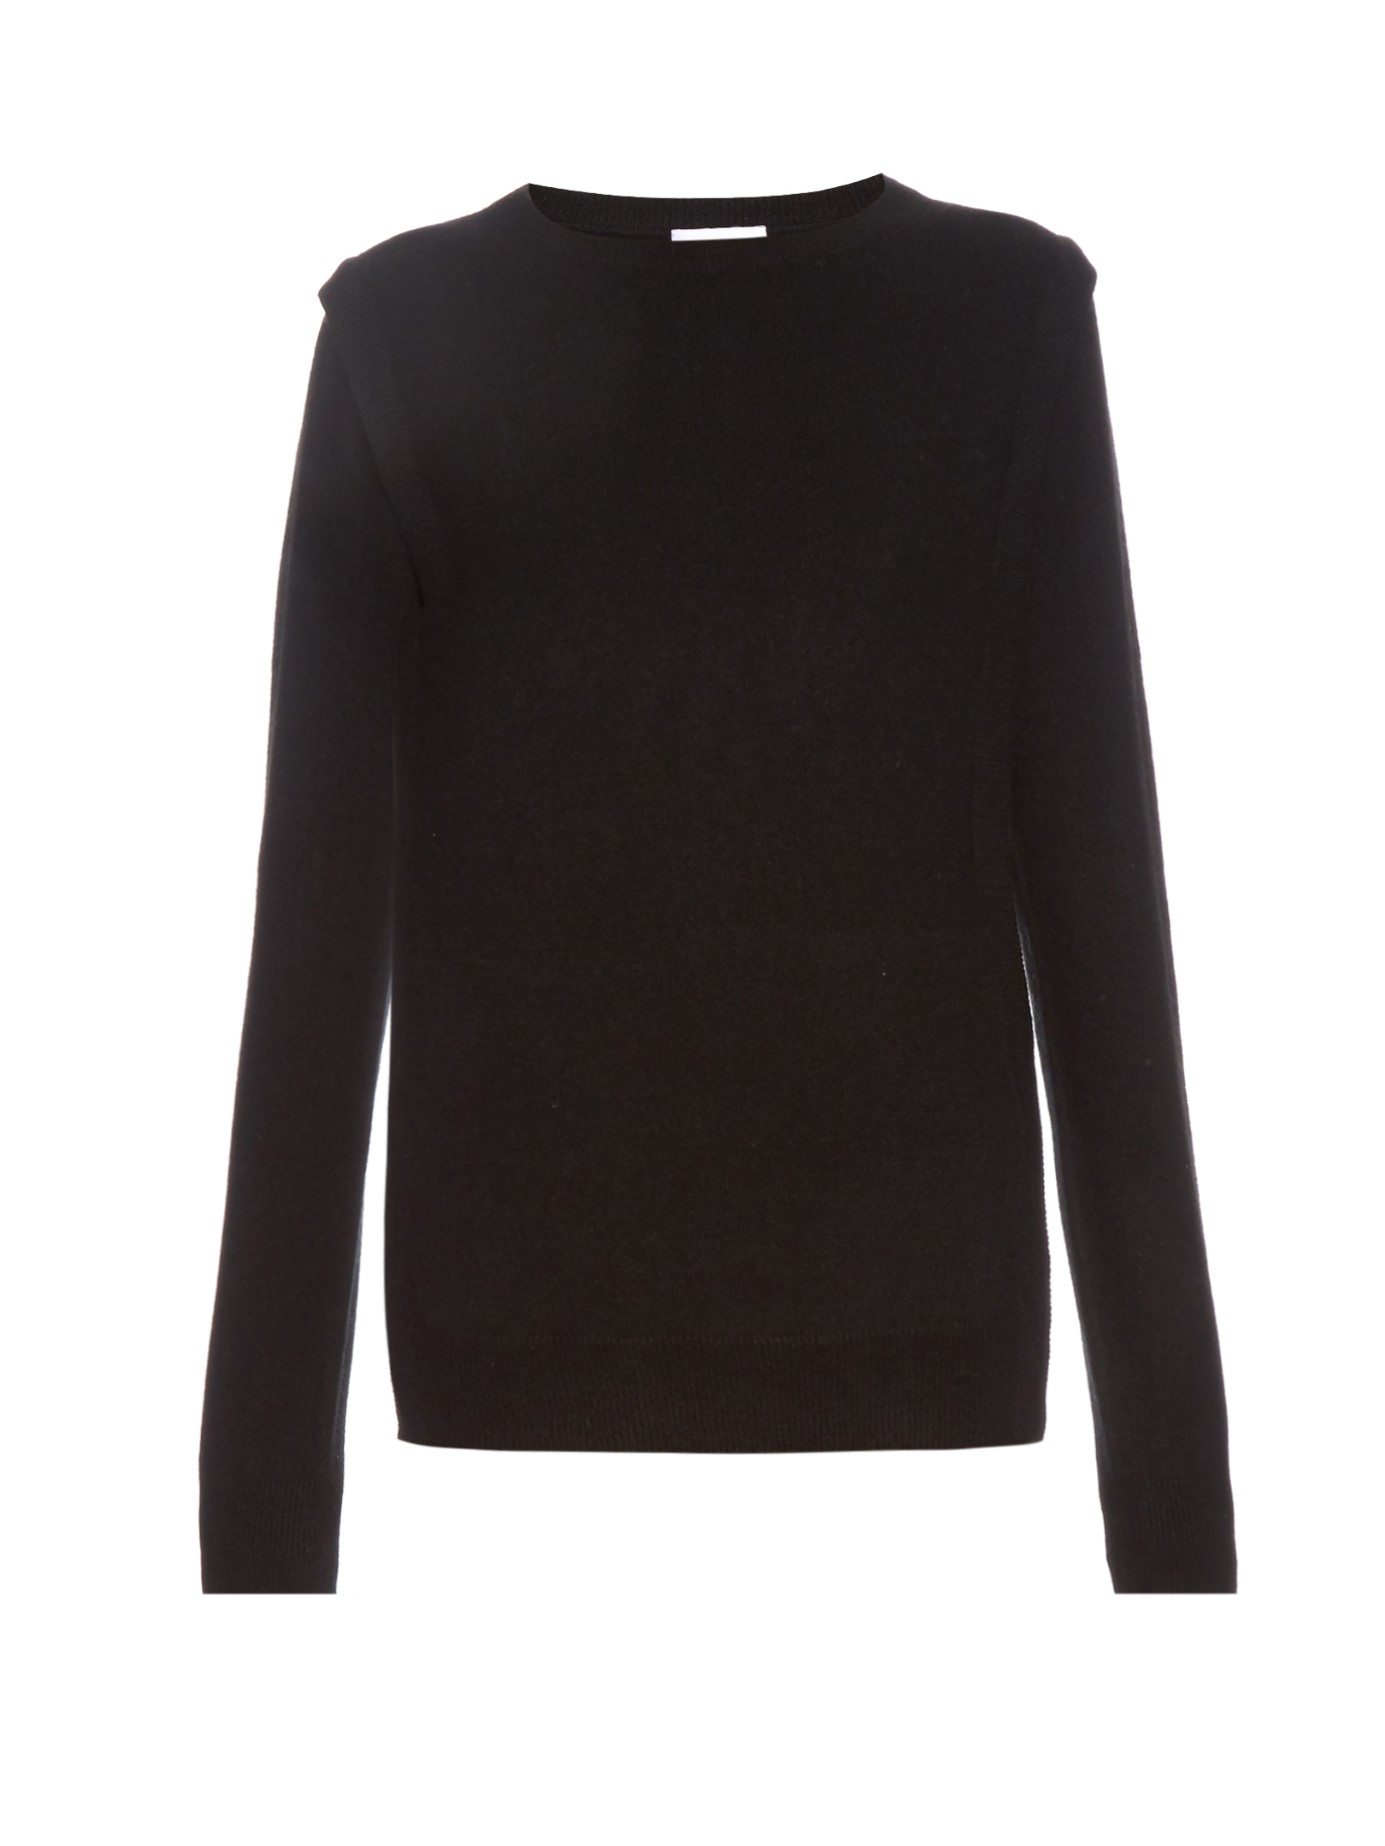 Wardrobe Cornerstones – Cashmere Sweater